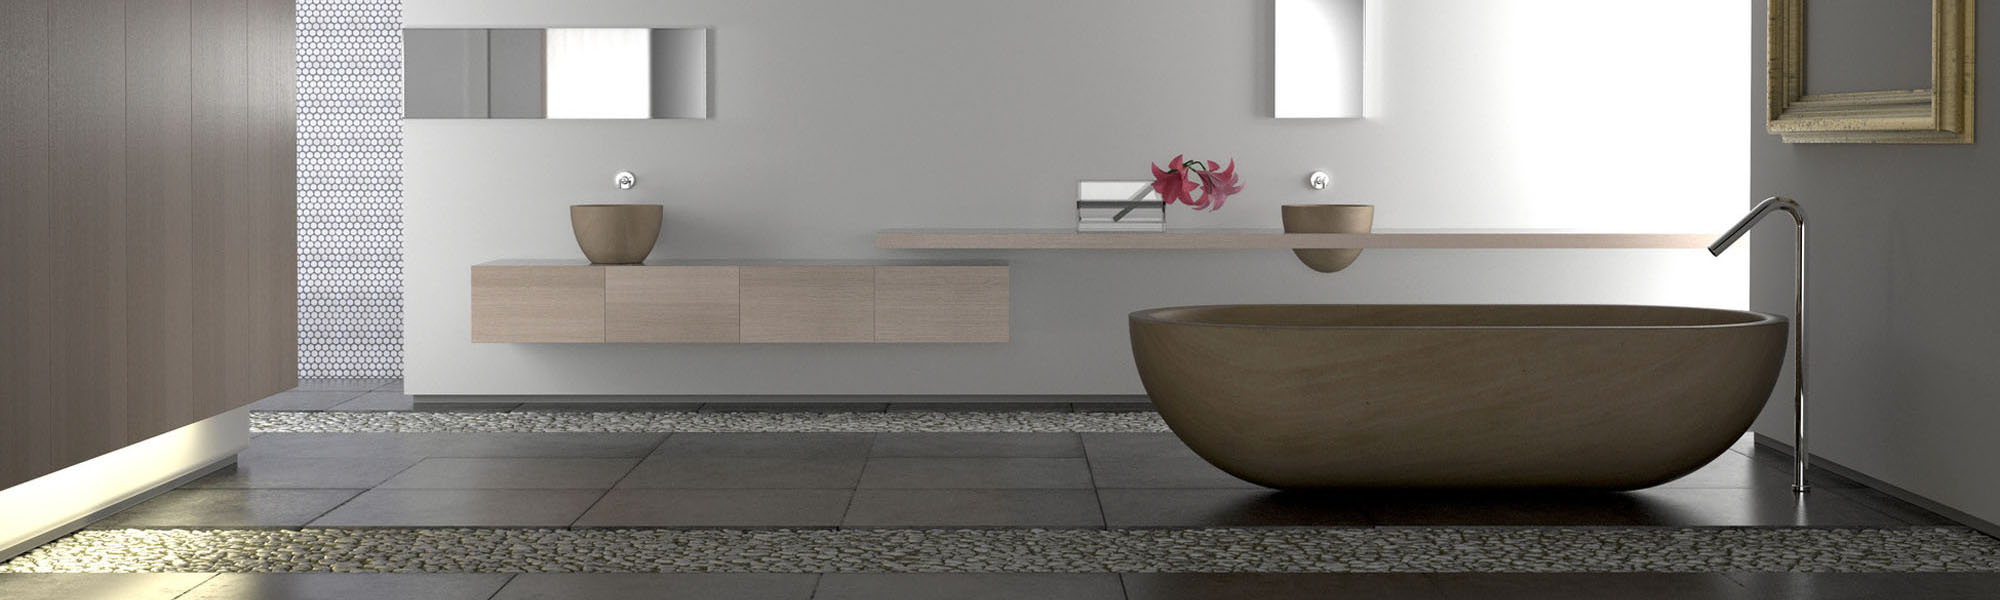 salle de bain r novation en aveyron 12 bcd concept. Black Bedroom Furniture Sets. Home Design Ideas